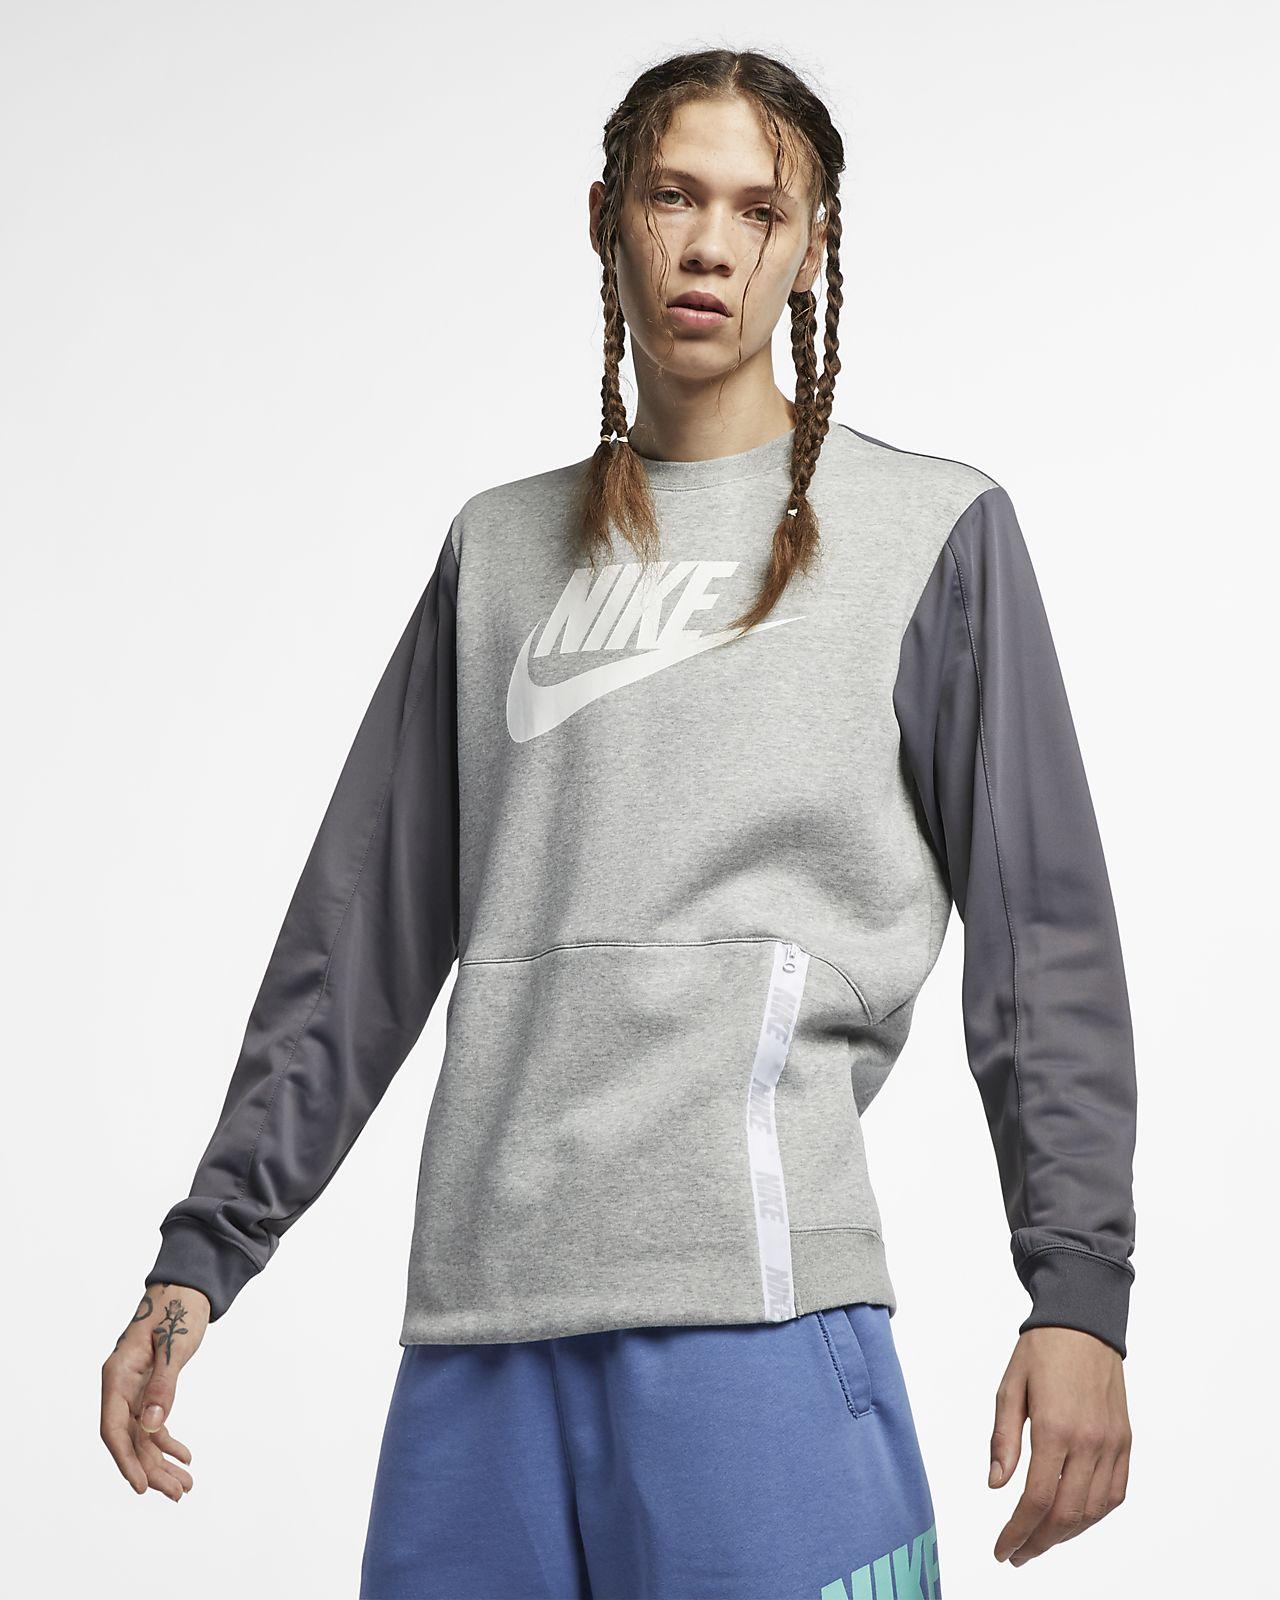 Nike Sportswear Herenshirt met ronde hals